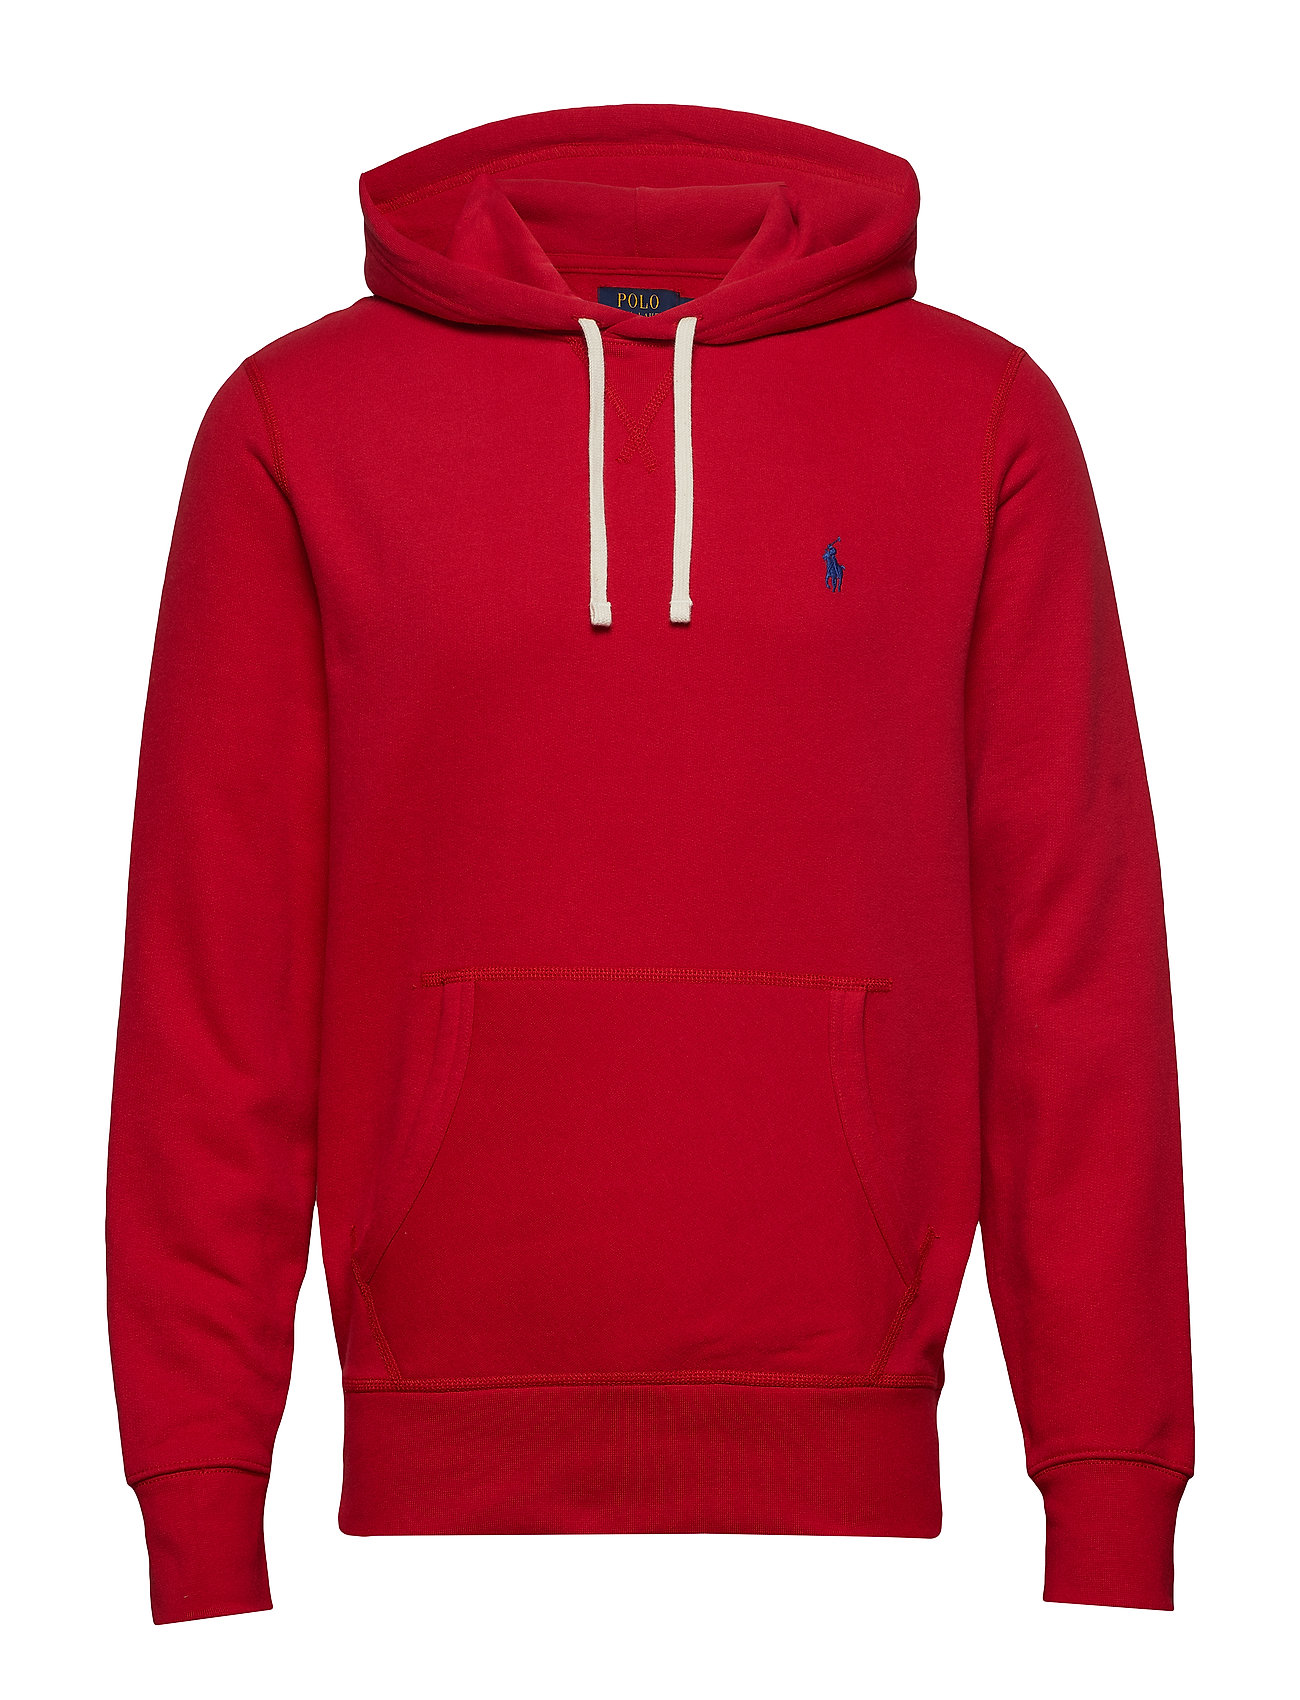 Polo Ralph Lauren Fleece Hoodie - POLO SPORT RED